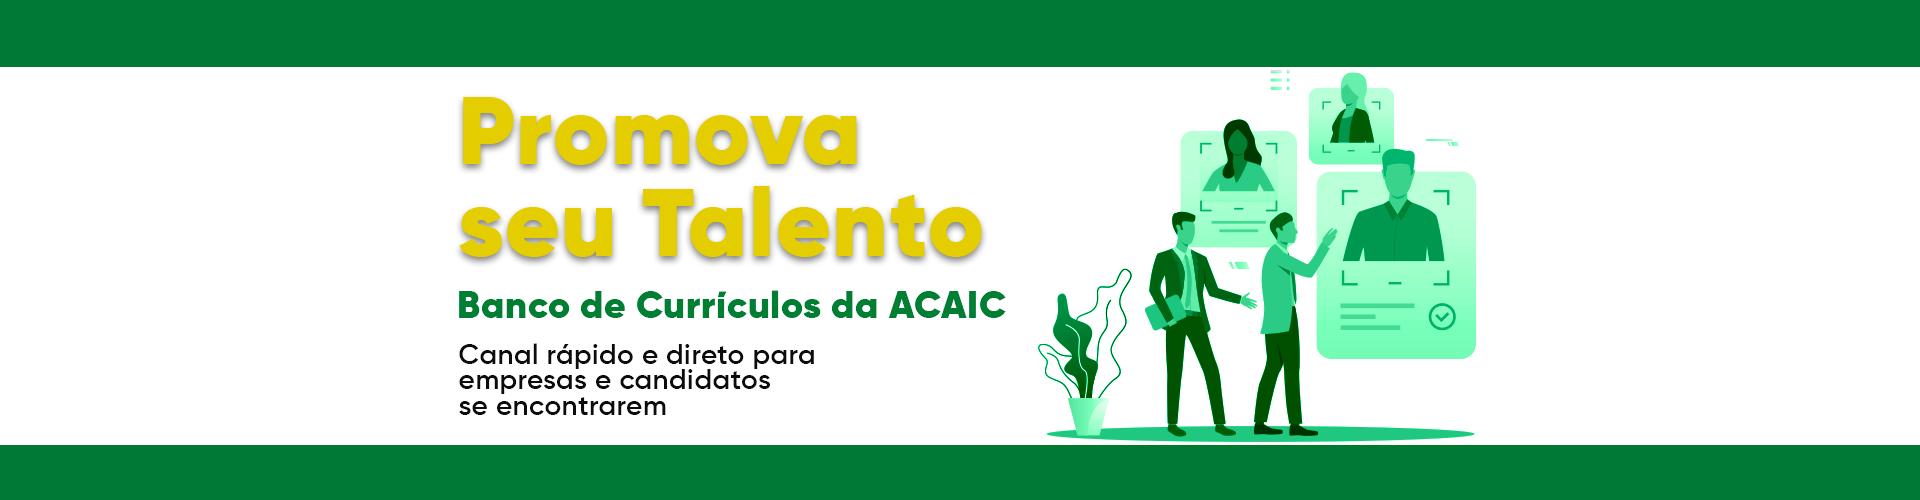 acaic-novo-banner-curriculos.png